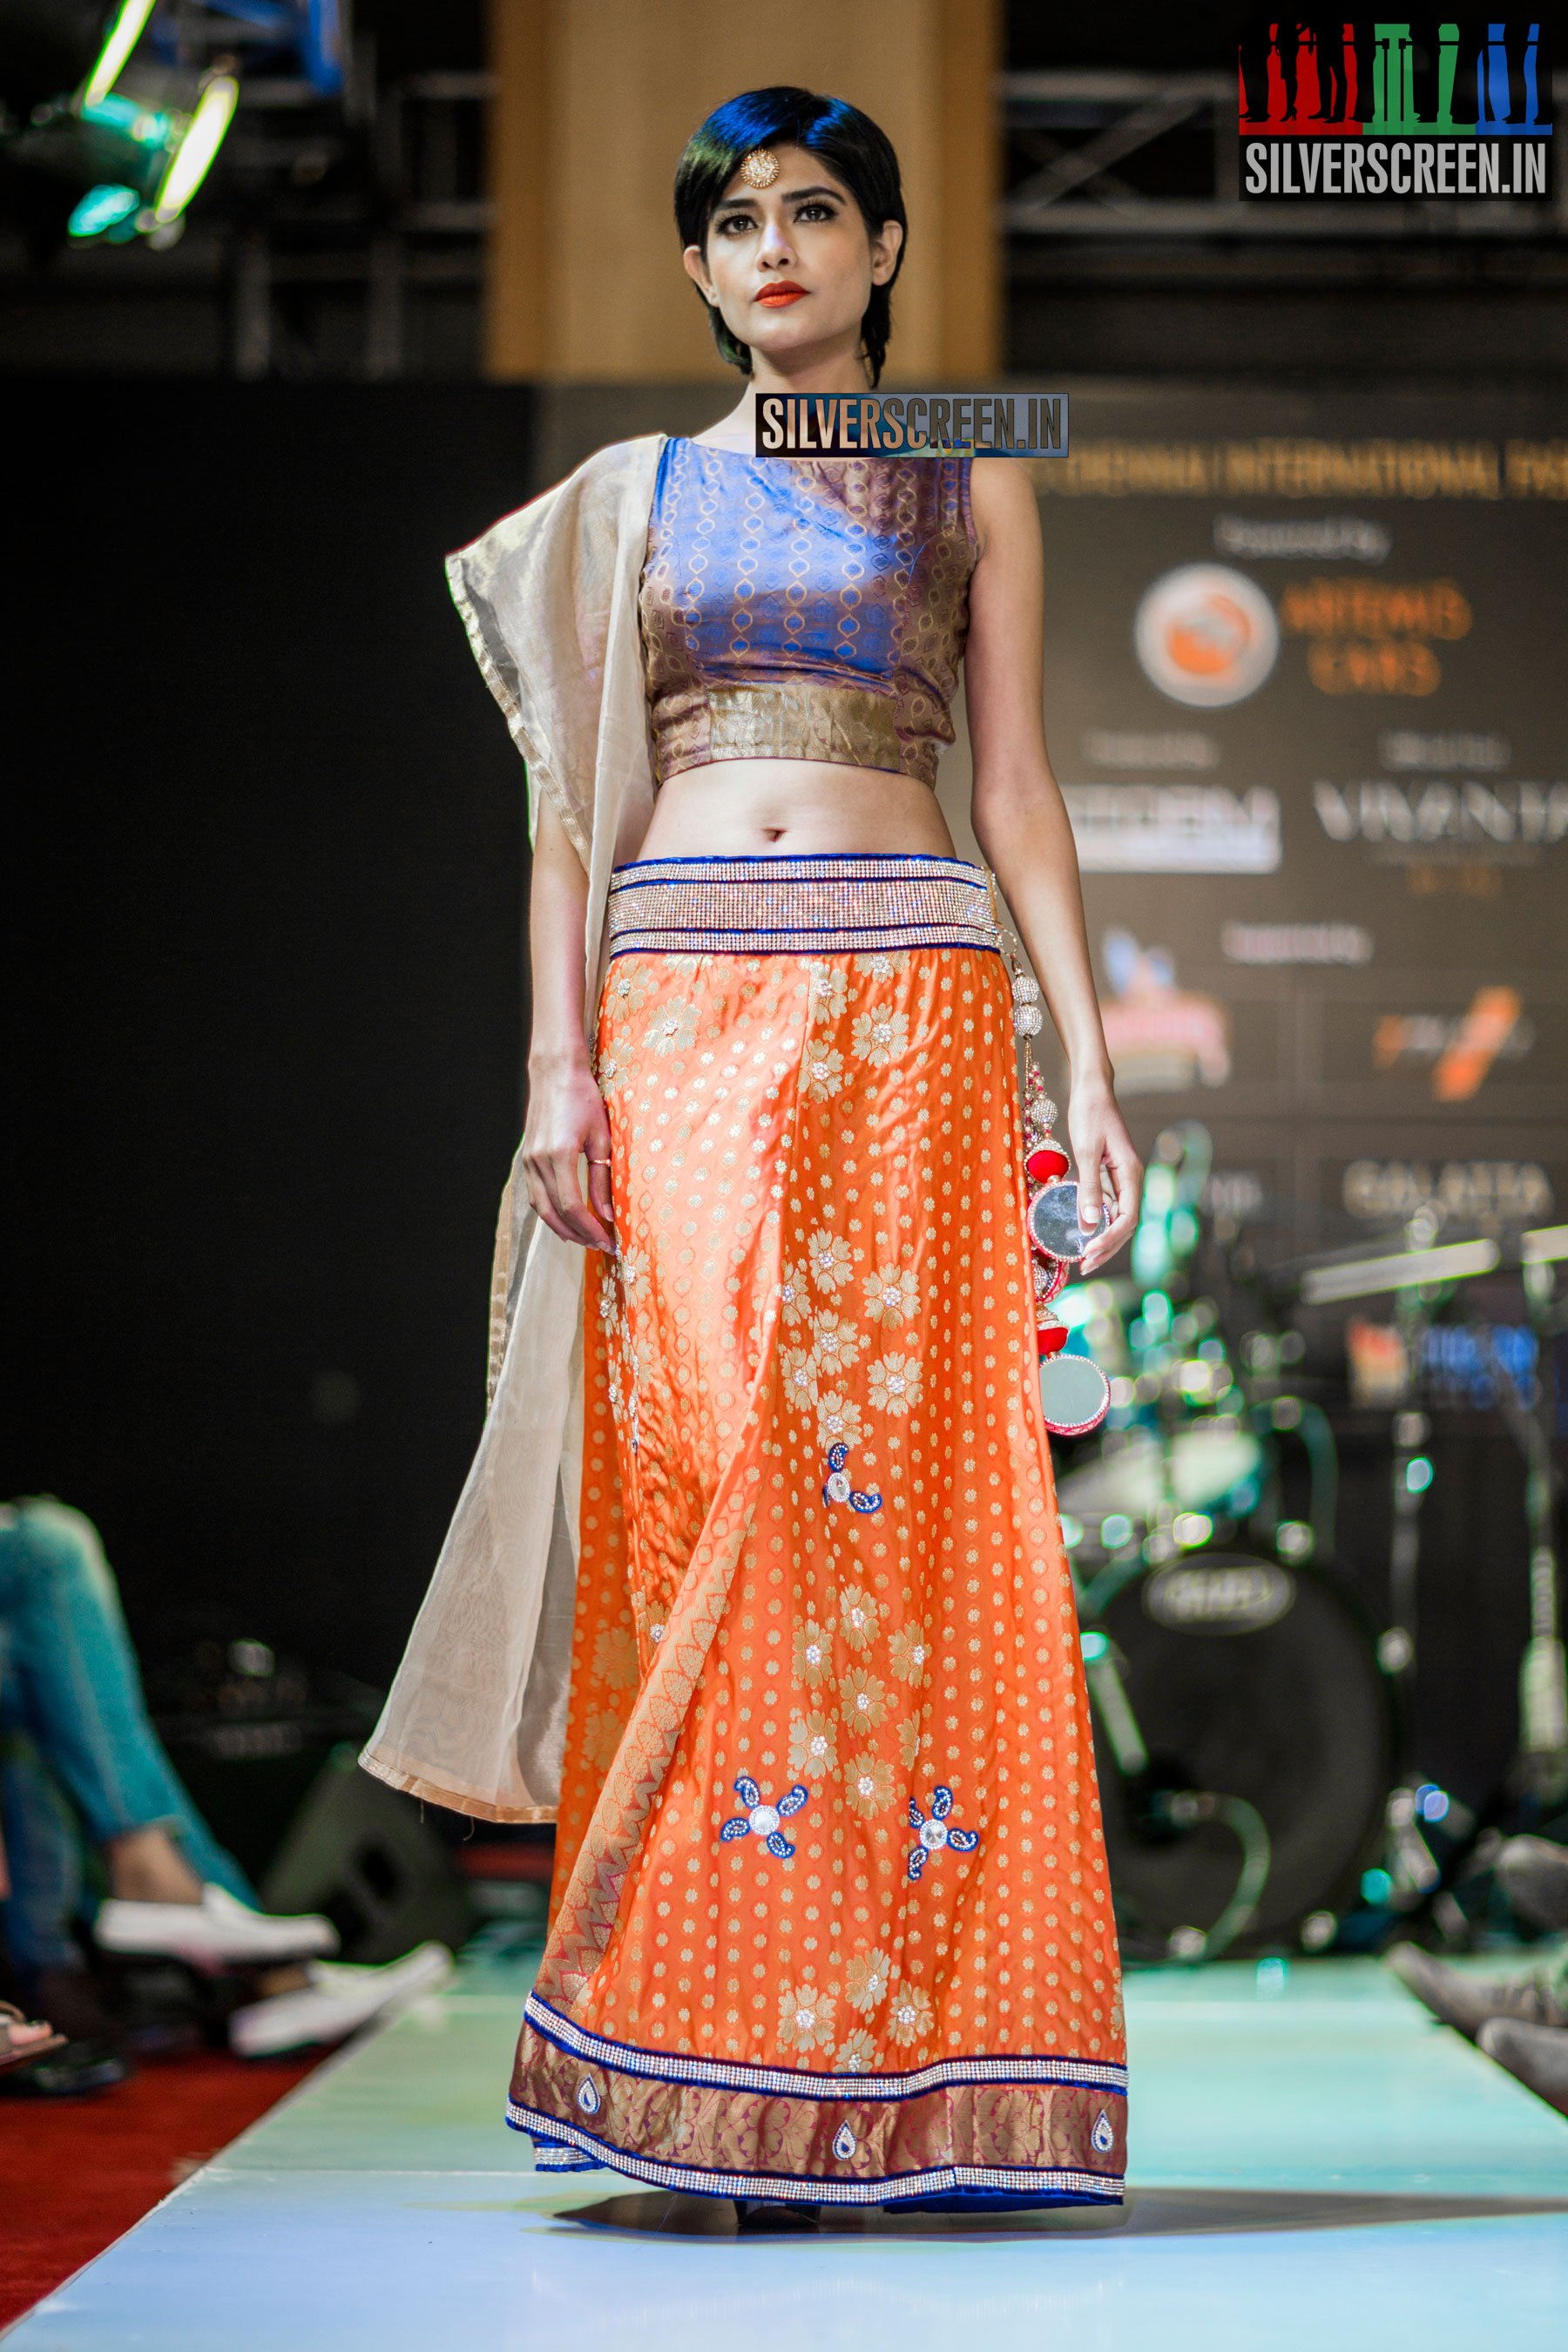 Chennai International Fashion Week 2015 HQ Photos